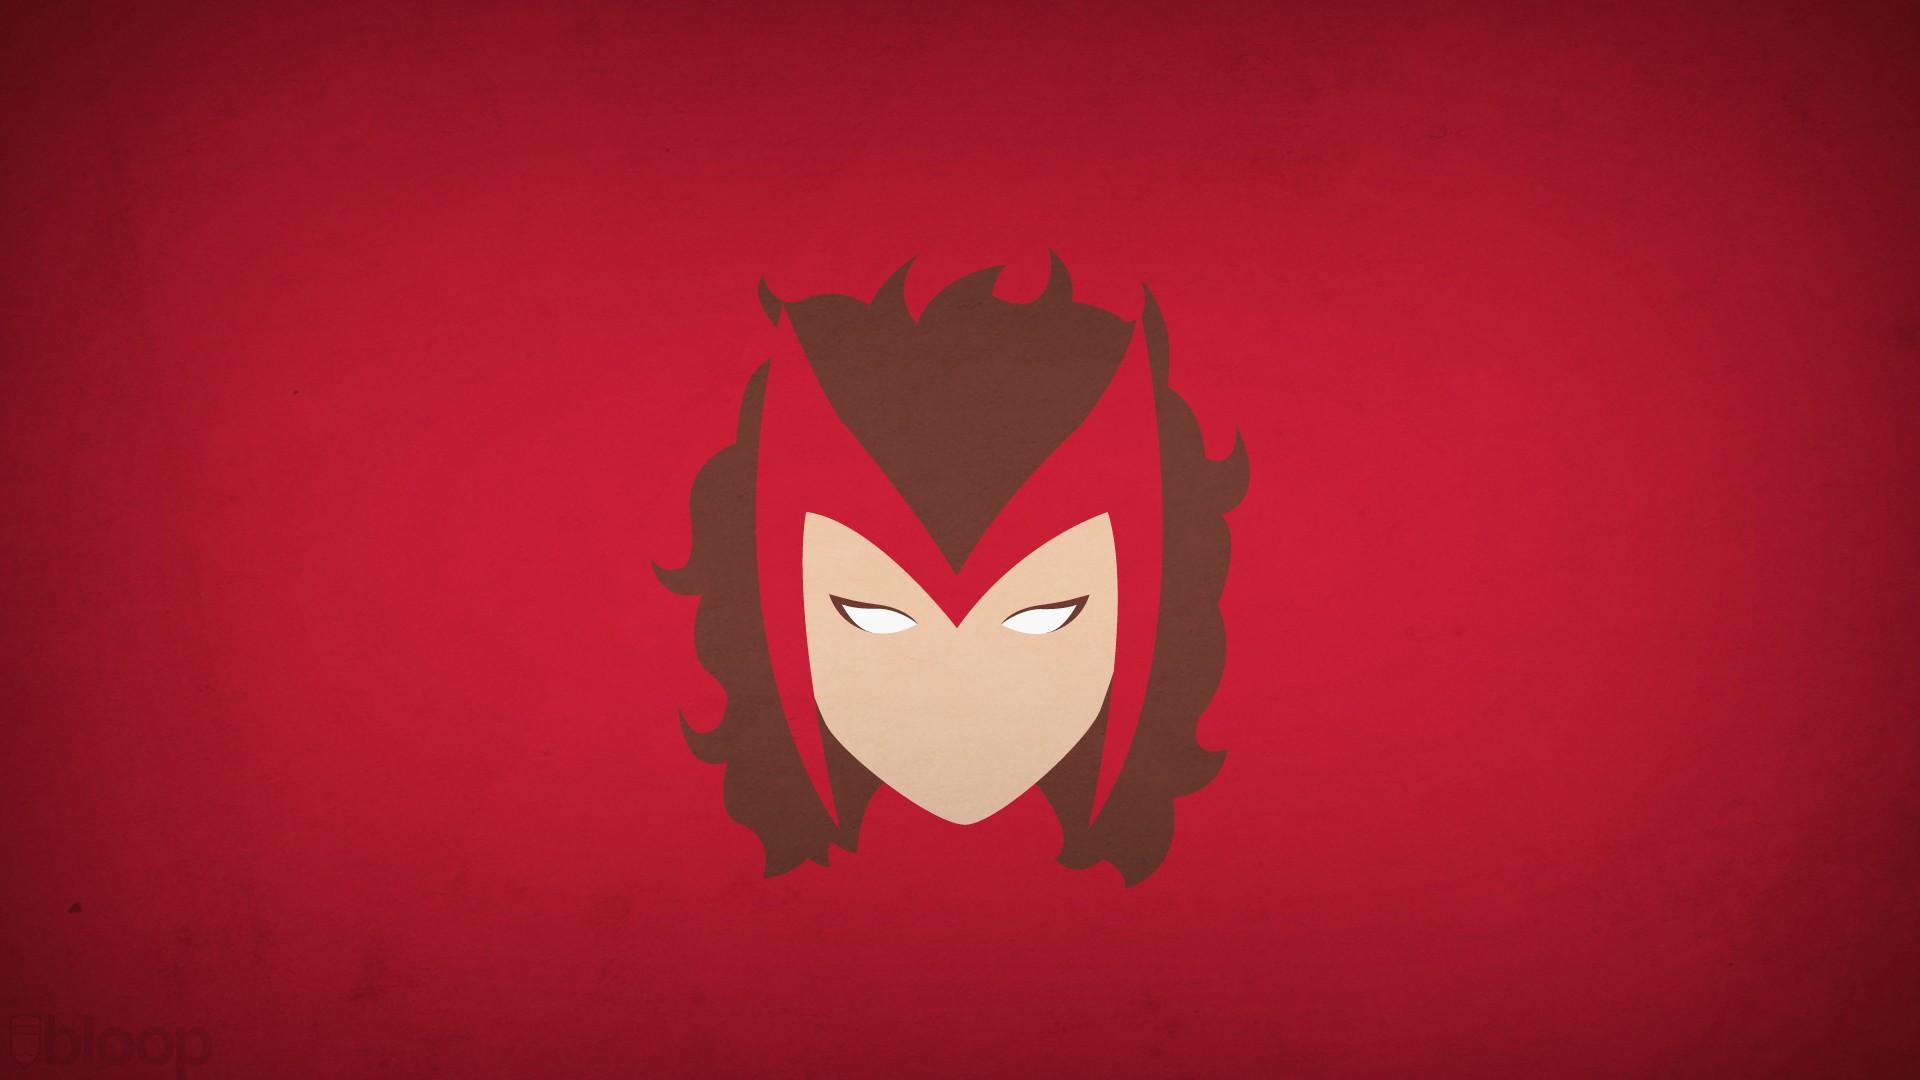 Good Wallpaper Marvel Simple - illustration-simple-background-minimalism-red-logo-red-background-hero-Marvel-Comics-Scarlet-Witch-Blo0p-computer-wallpaper-font-organ-219412  Image_878543.jpg